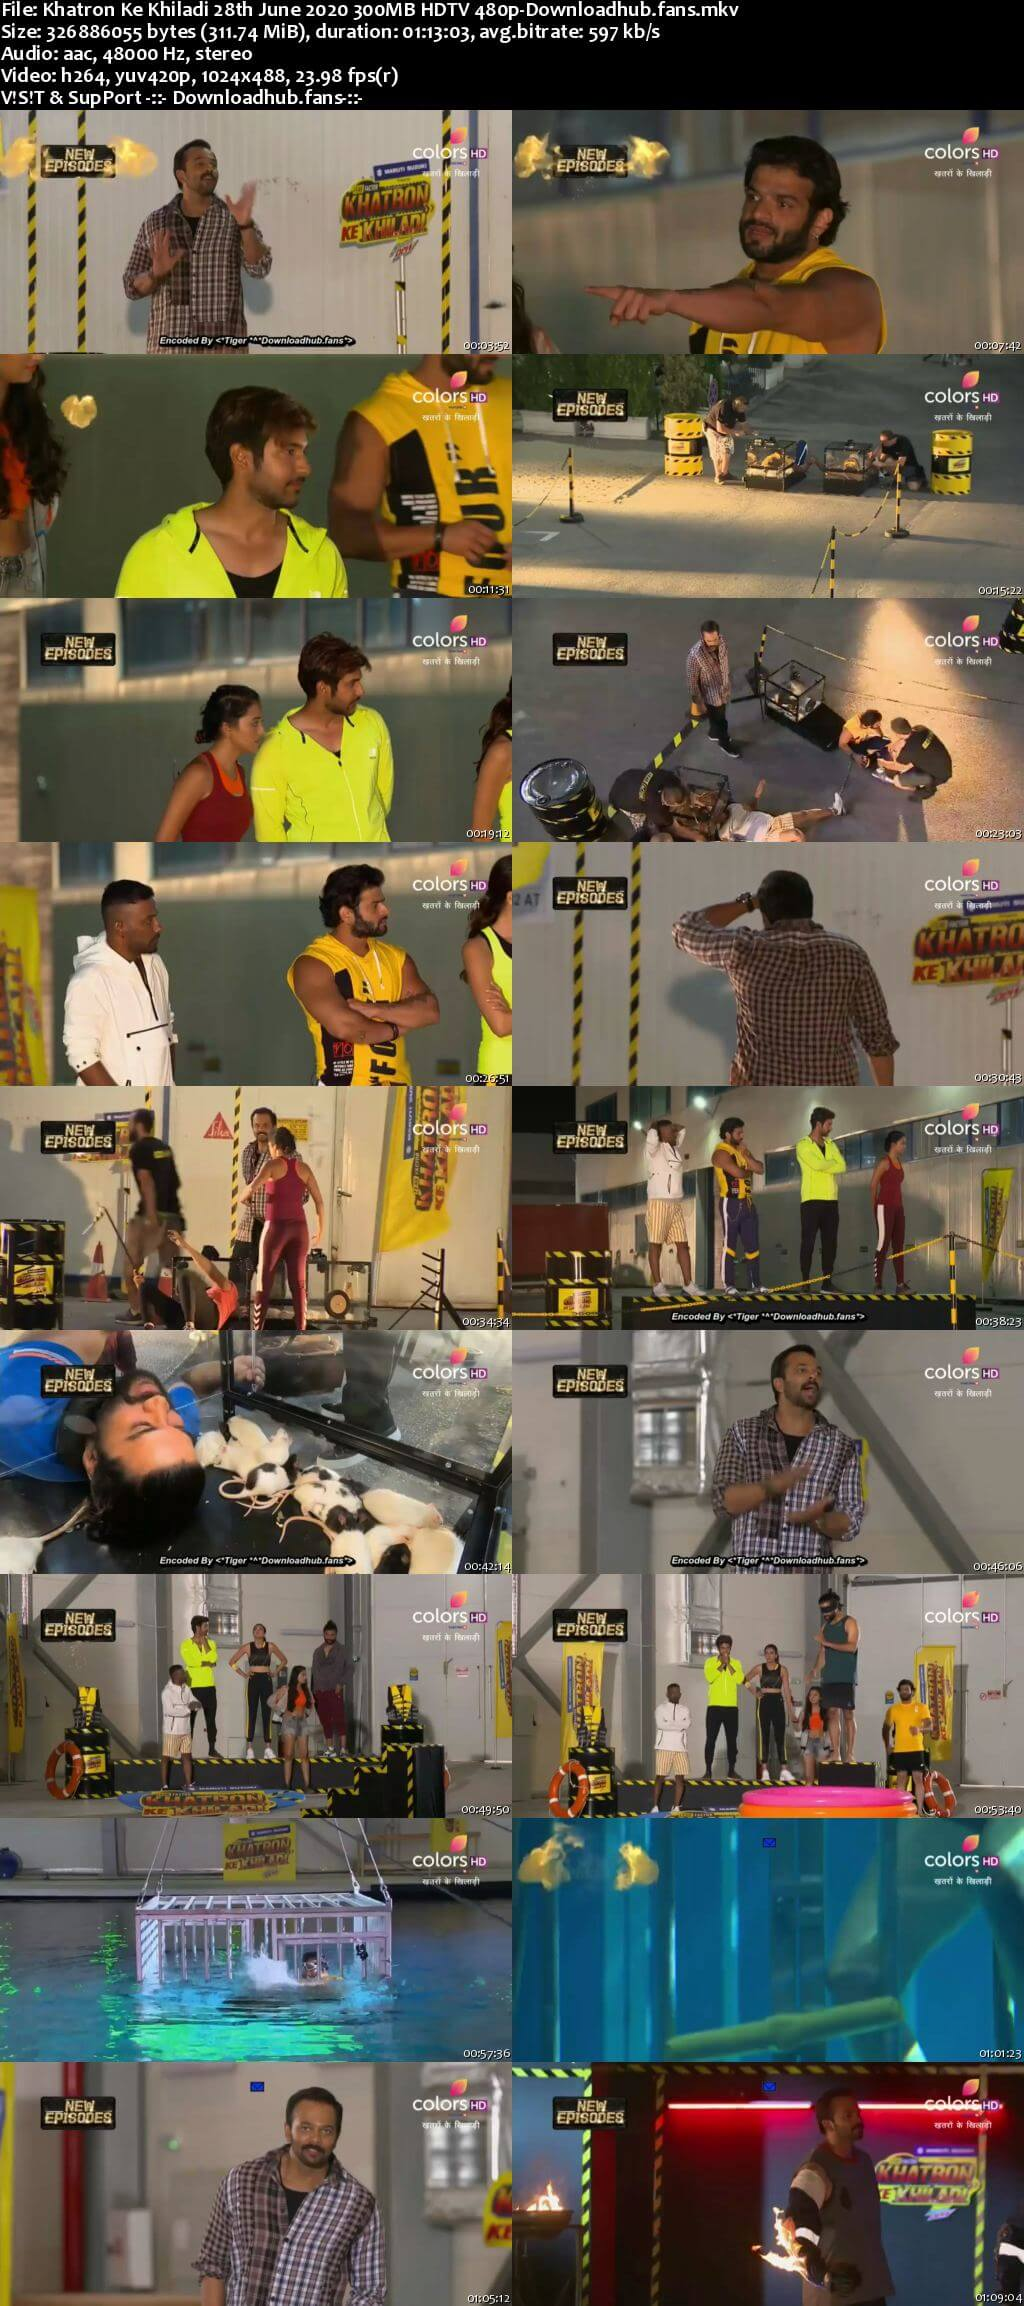 Khatron Ke Khiladi 28th June 2020 300MB HDTV 480p